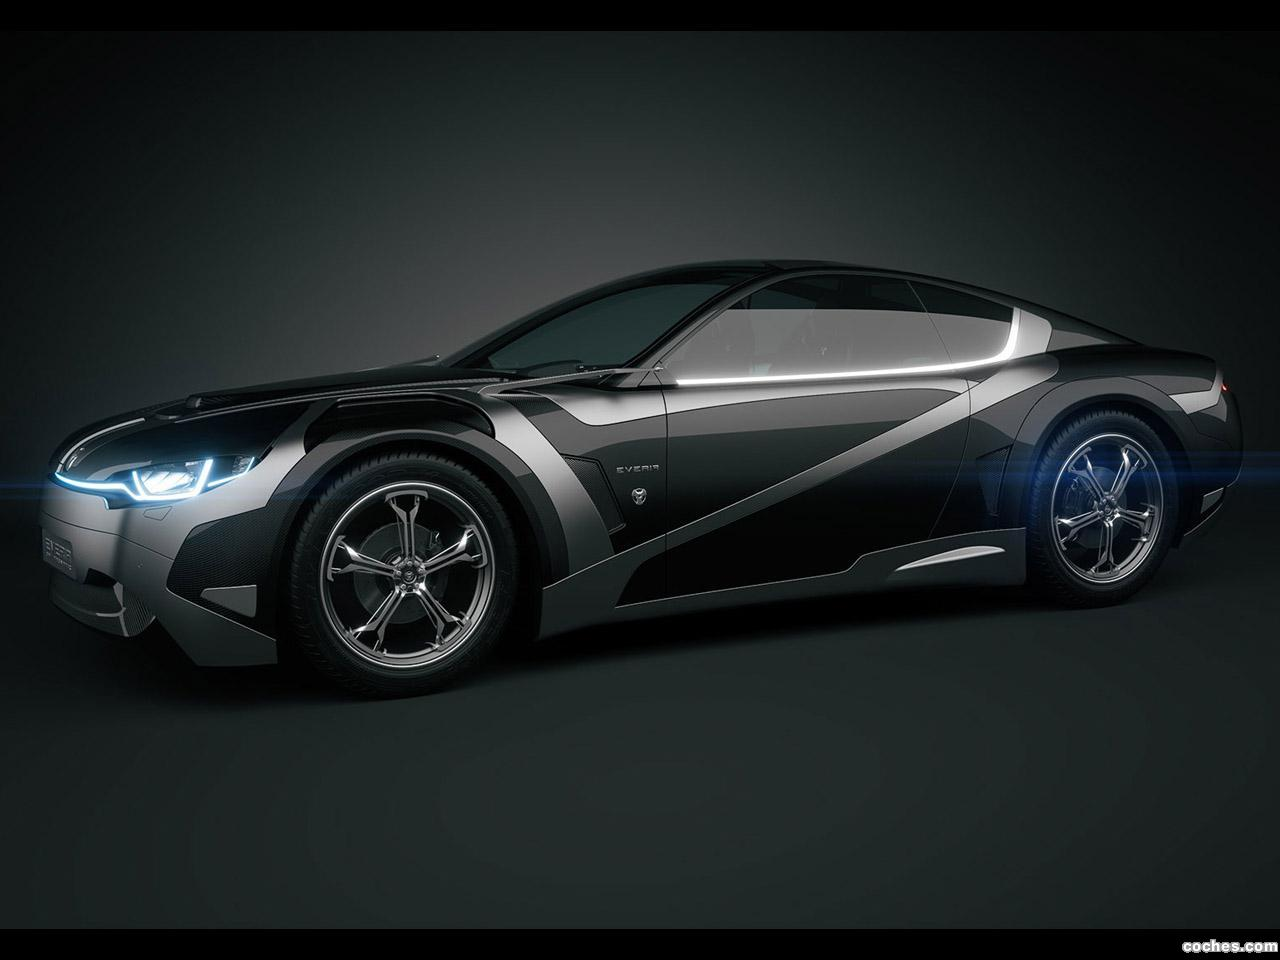 Foto 6 de Tronatic Everia Concept 2012